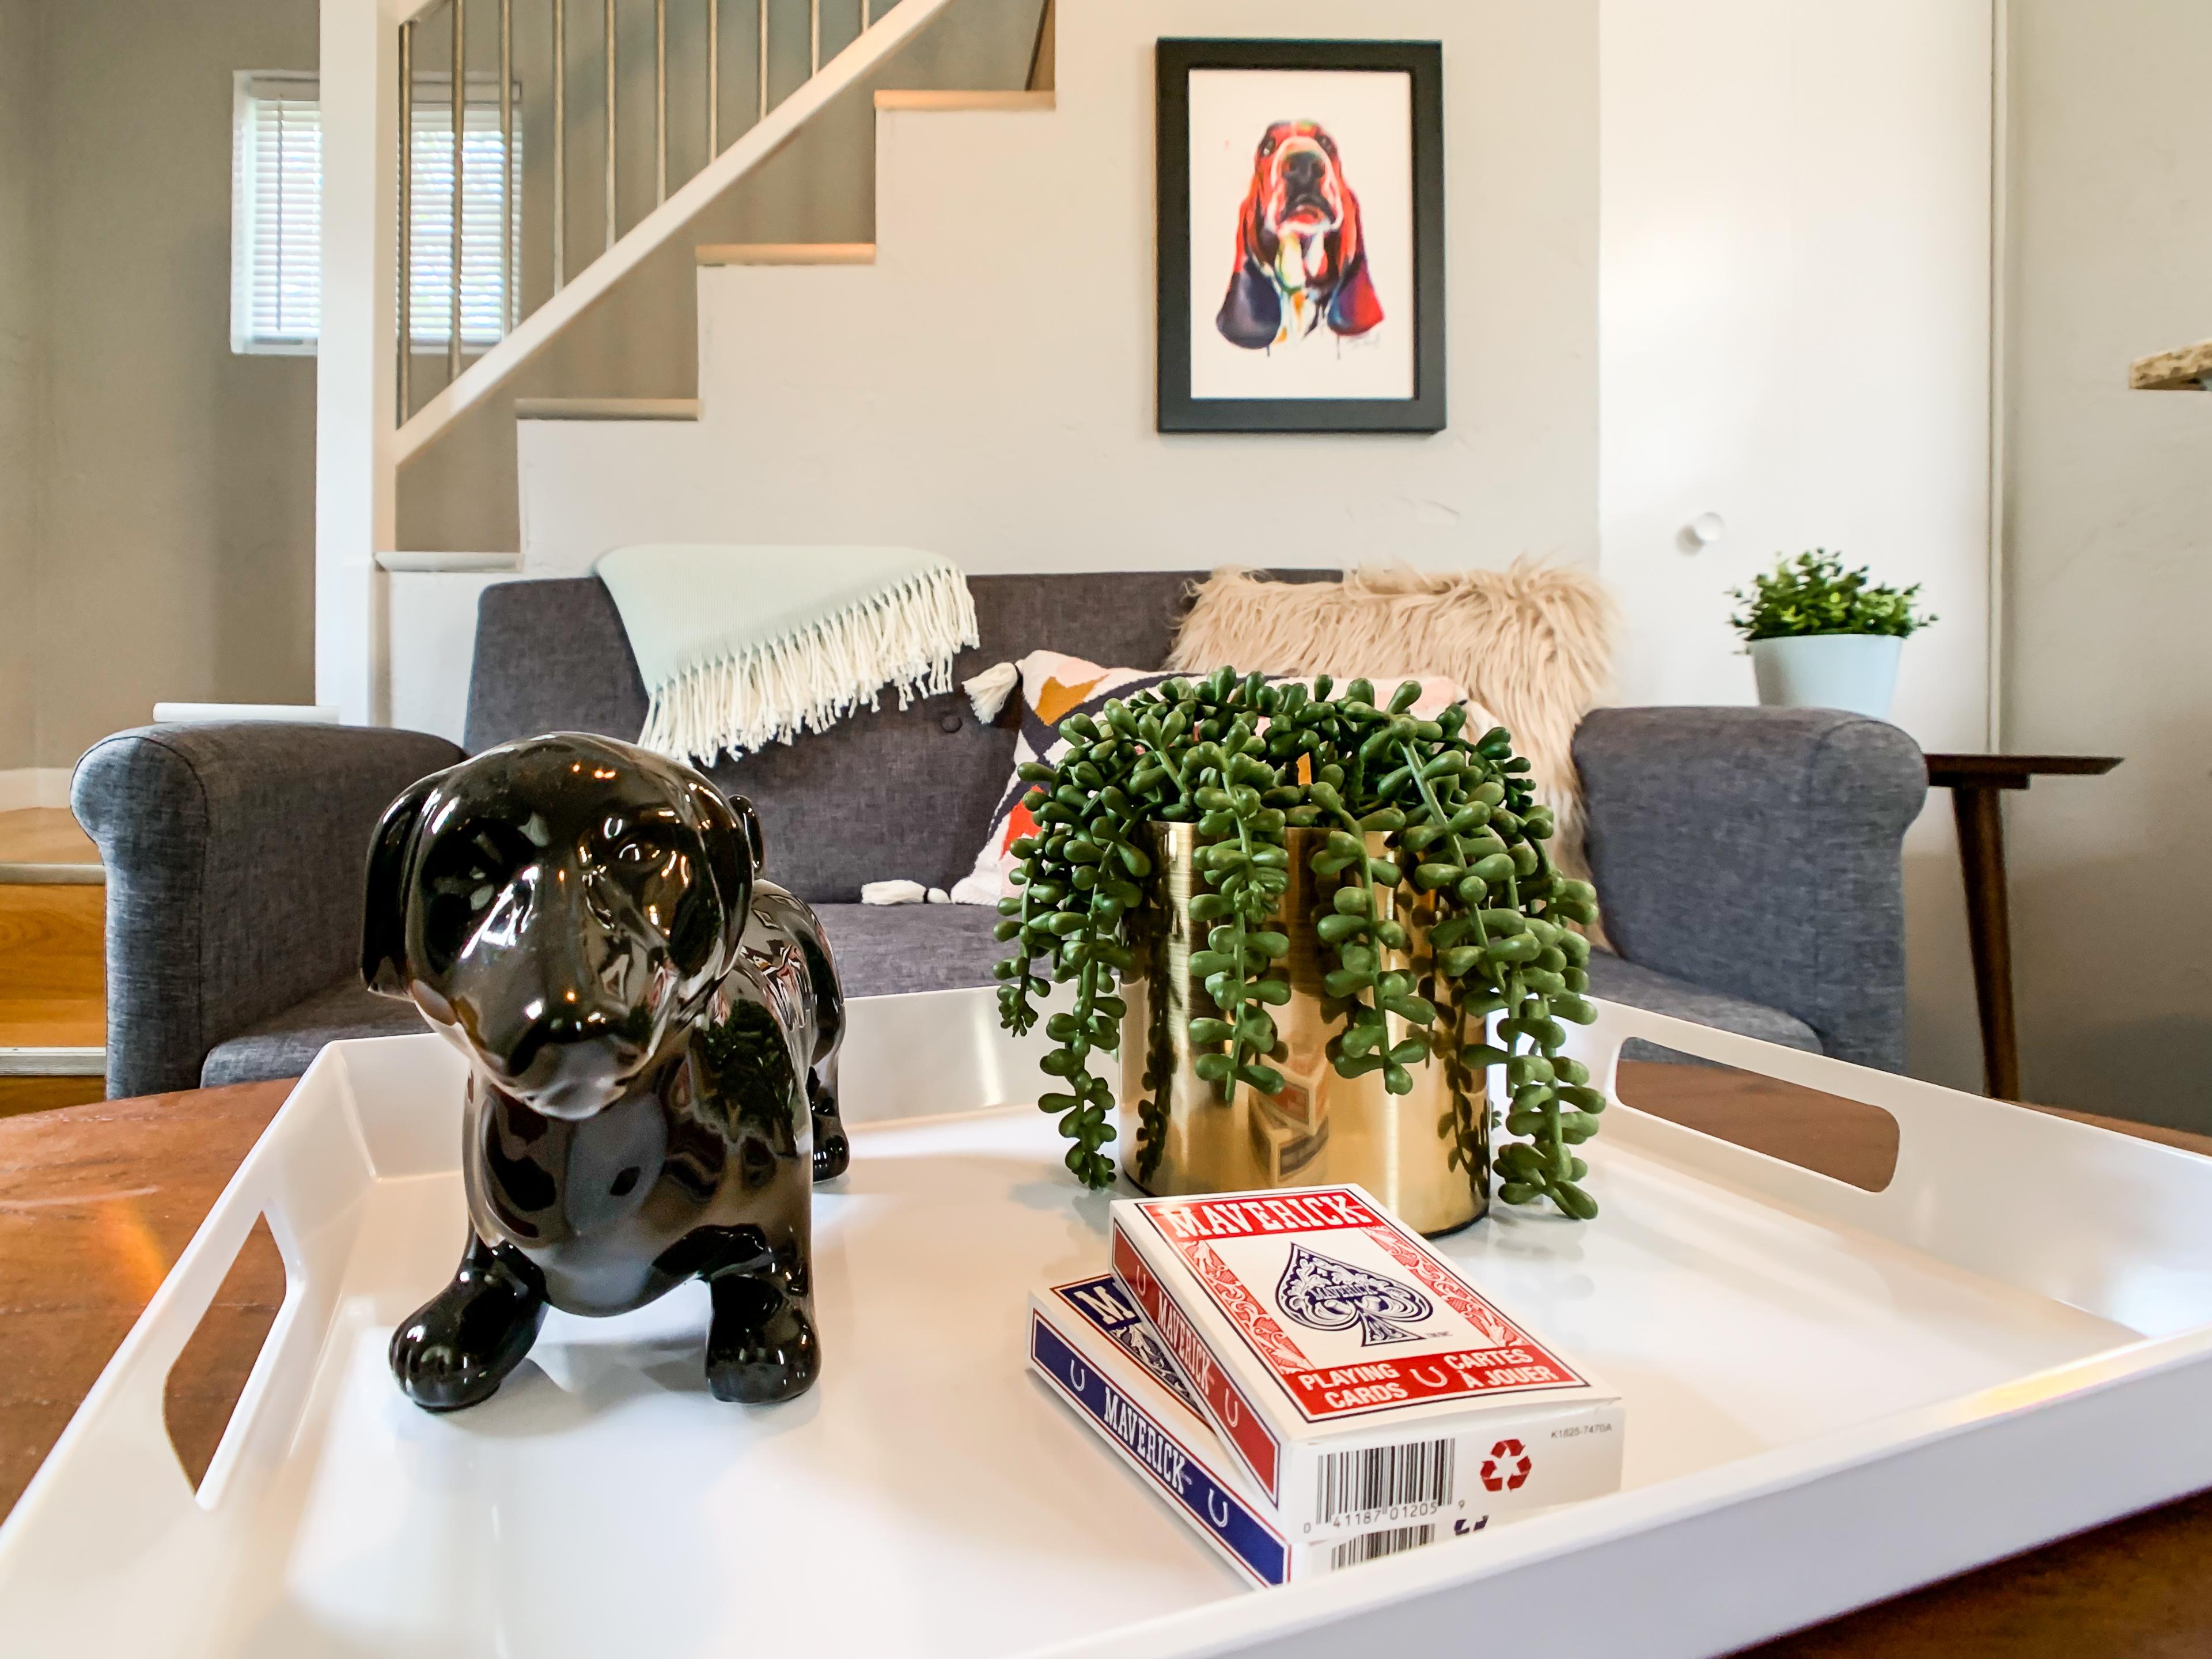 Hound Haus dog friendly vacation rental near Purina Events Center